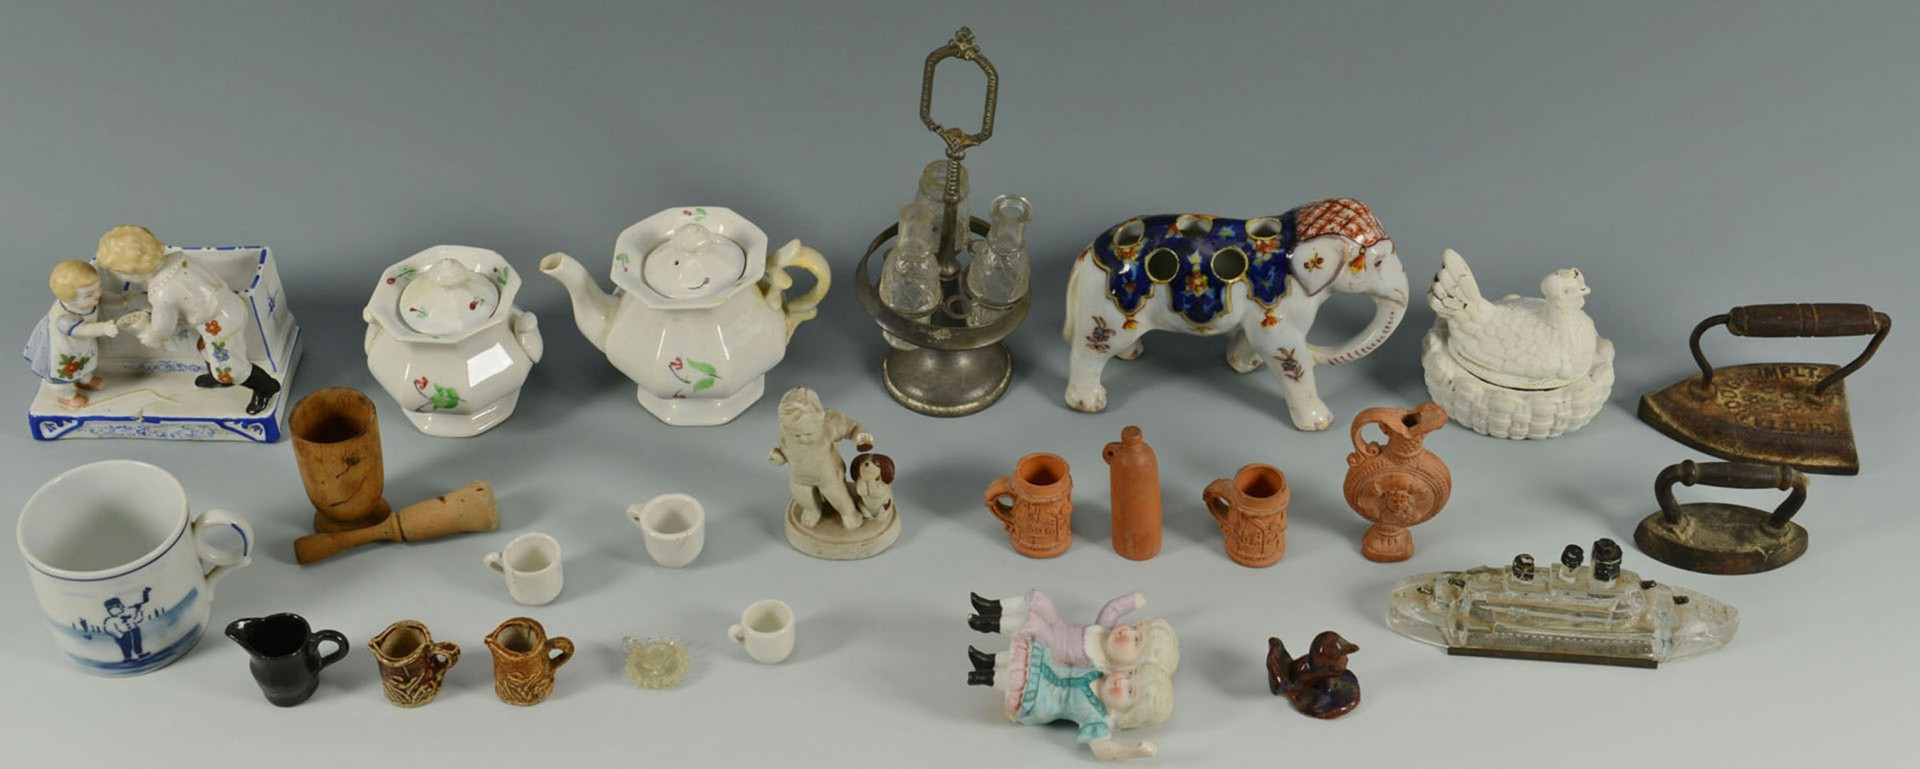 Lot 2872326: Group of 39 Various Miniatures